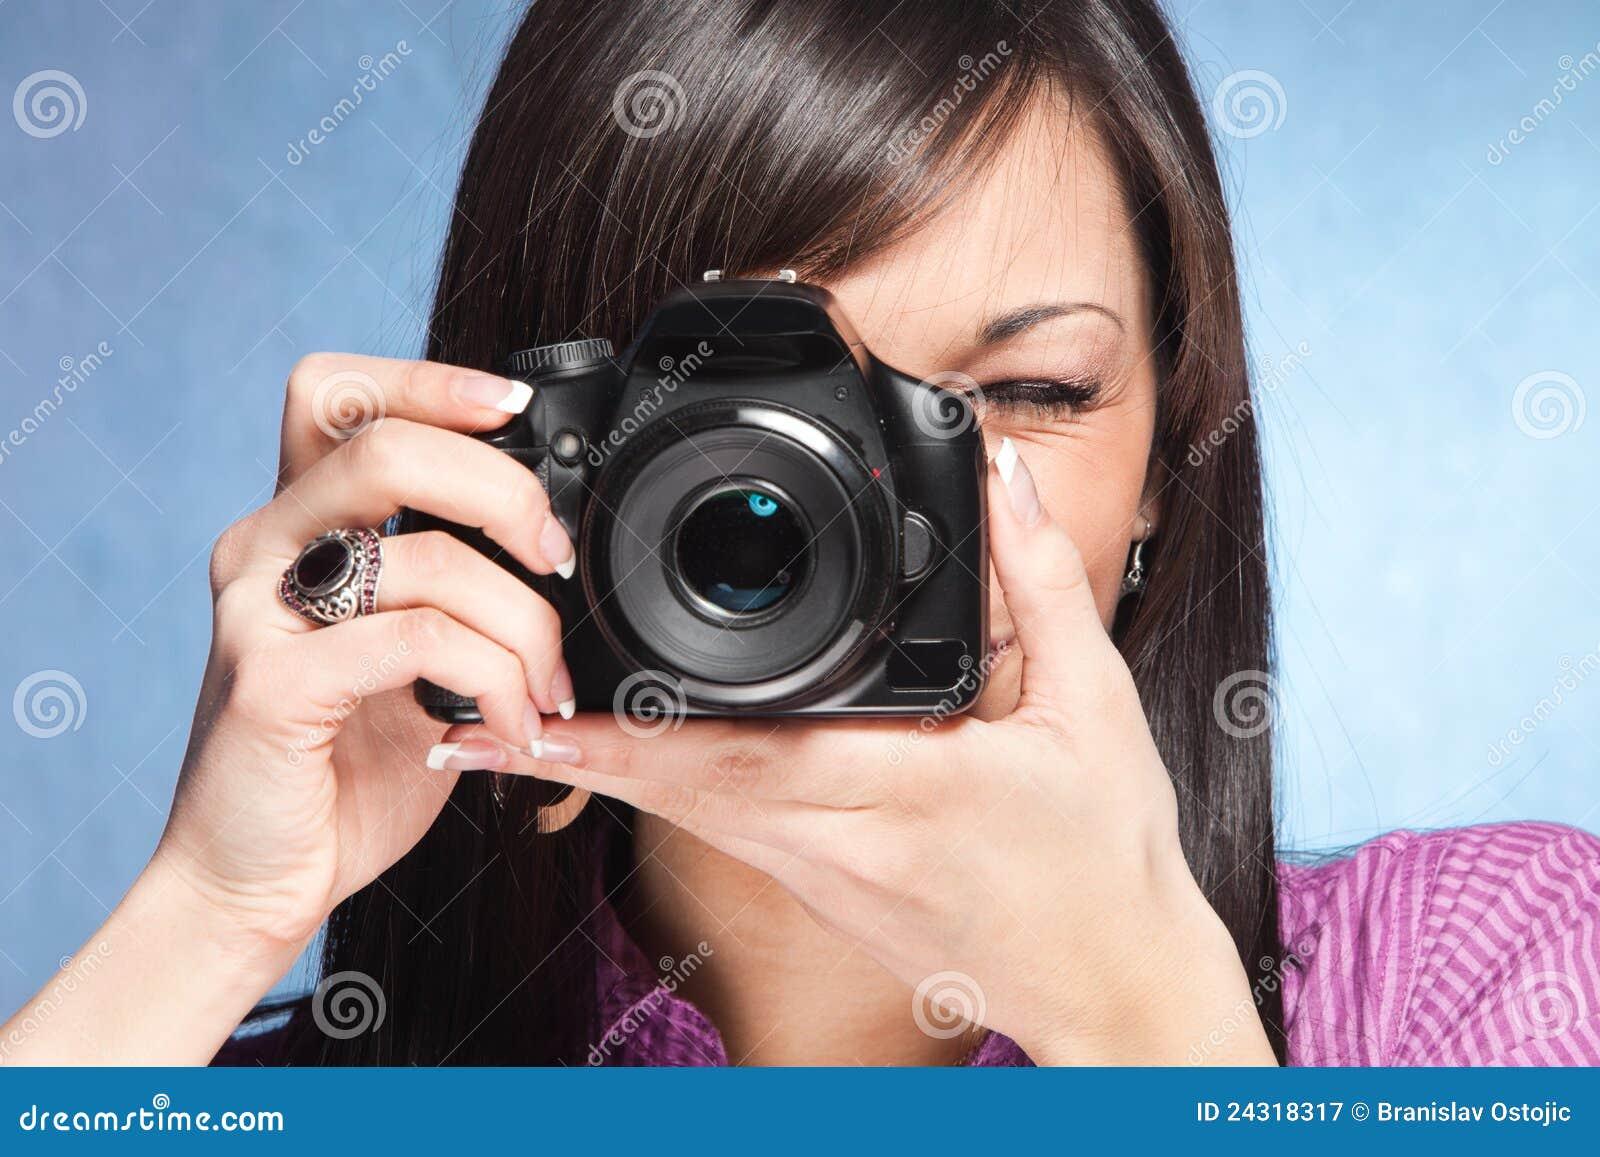 Girls on camera